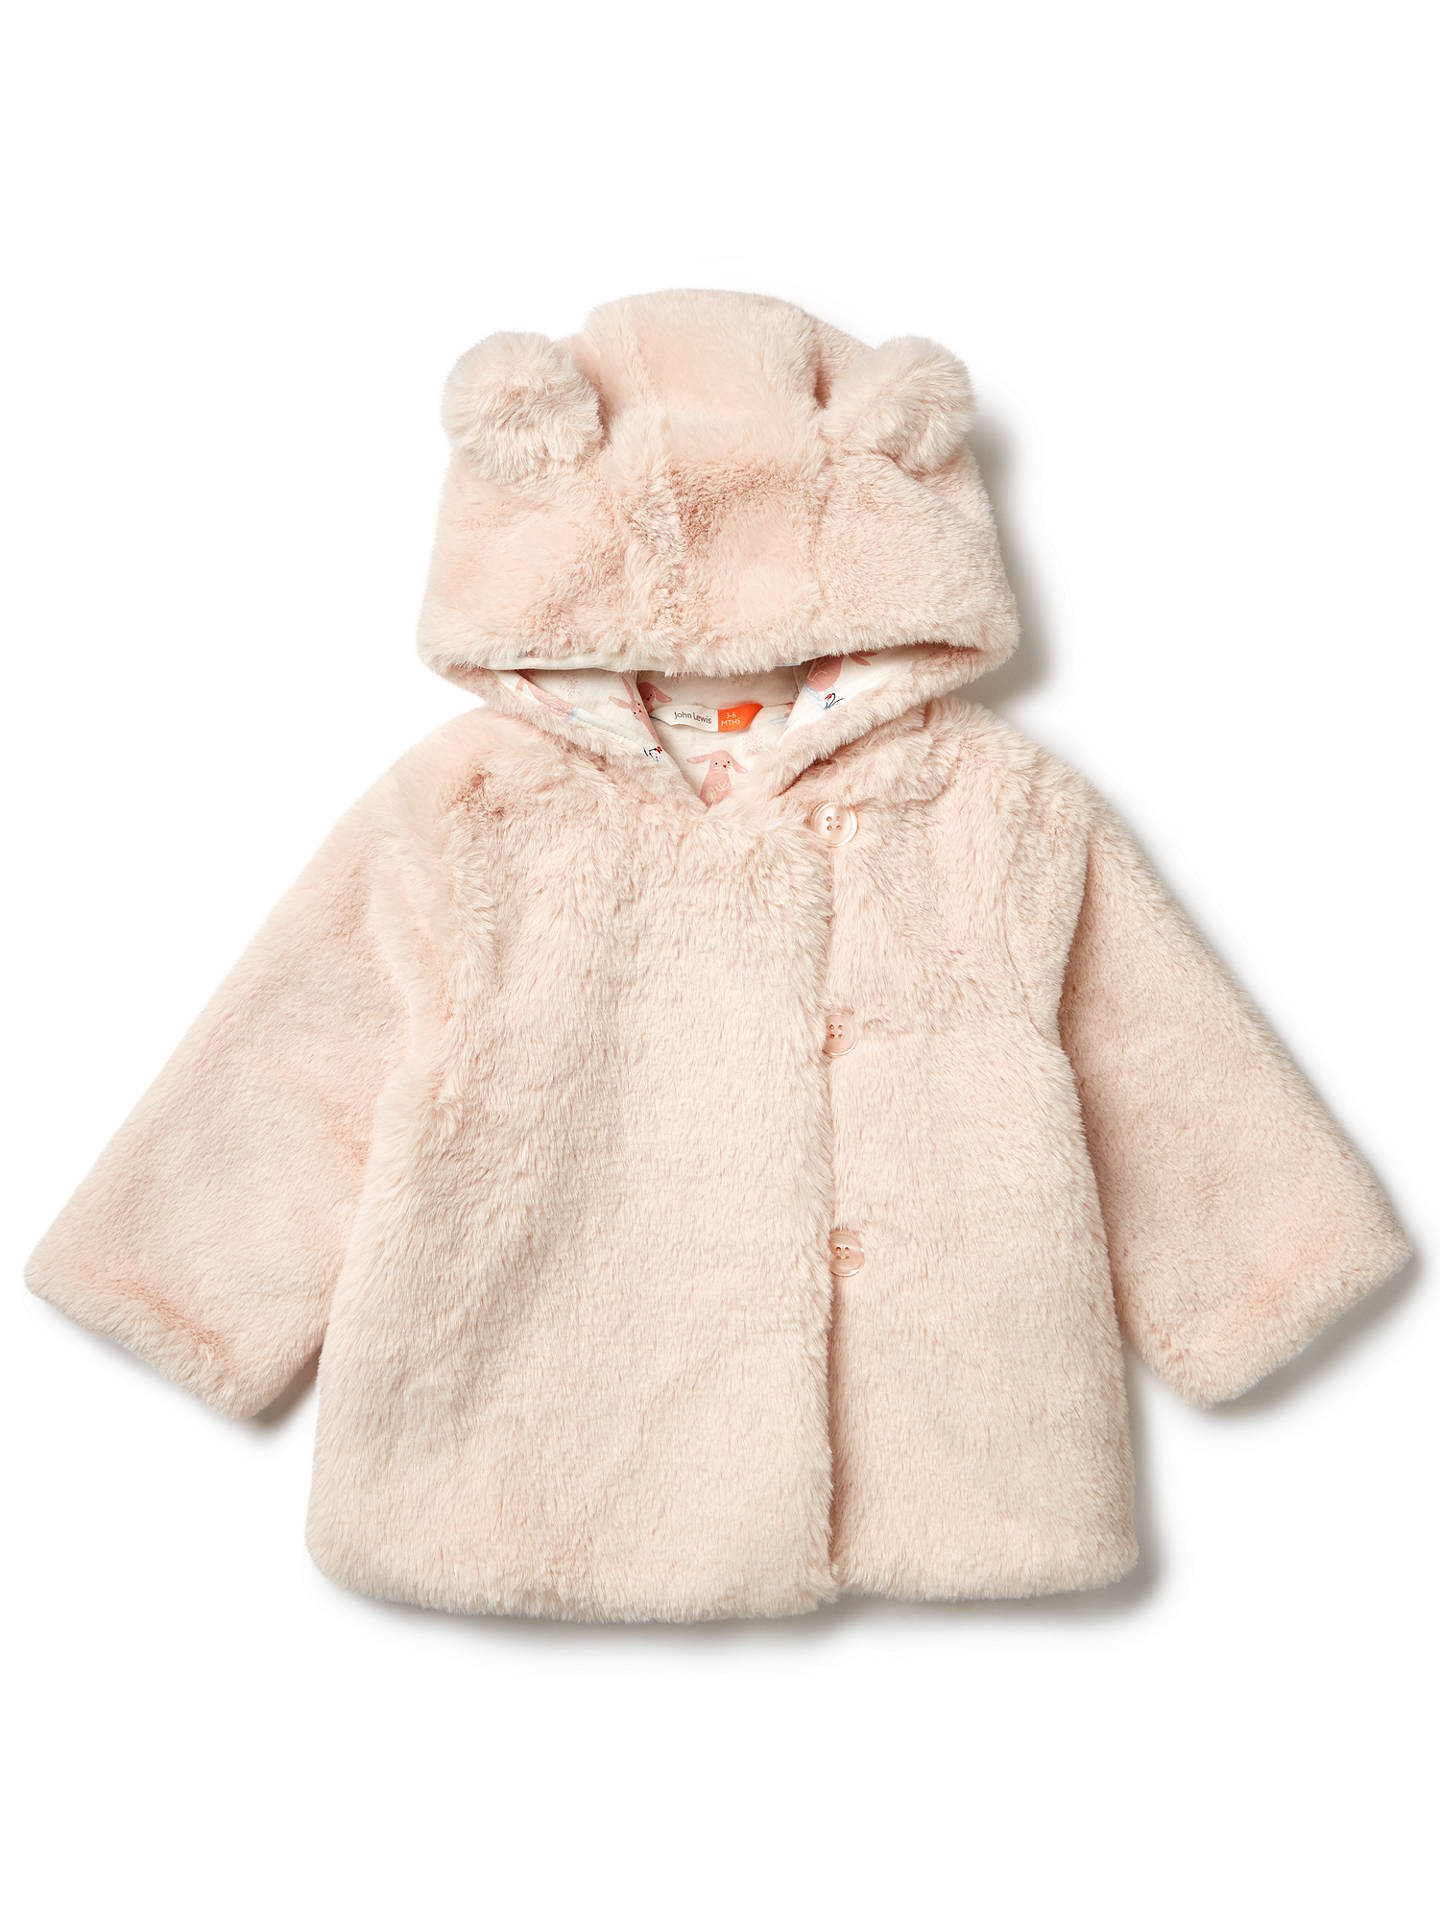 1ccd12b391d John Lewis & Partners Baby Faux Fur Coat, Pink at John Lewis & Partners